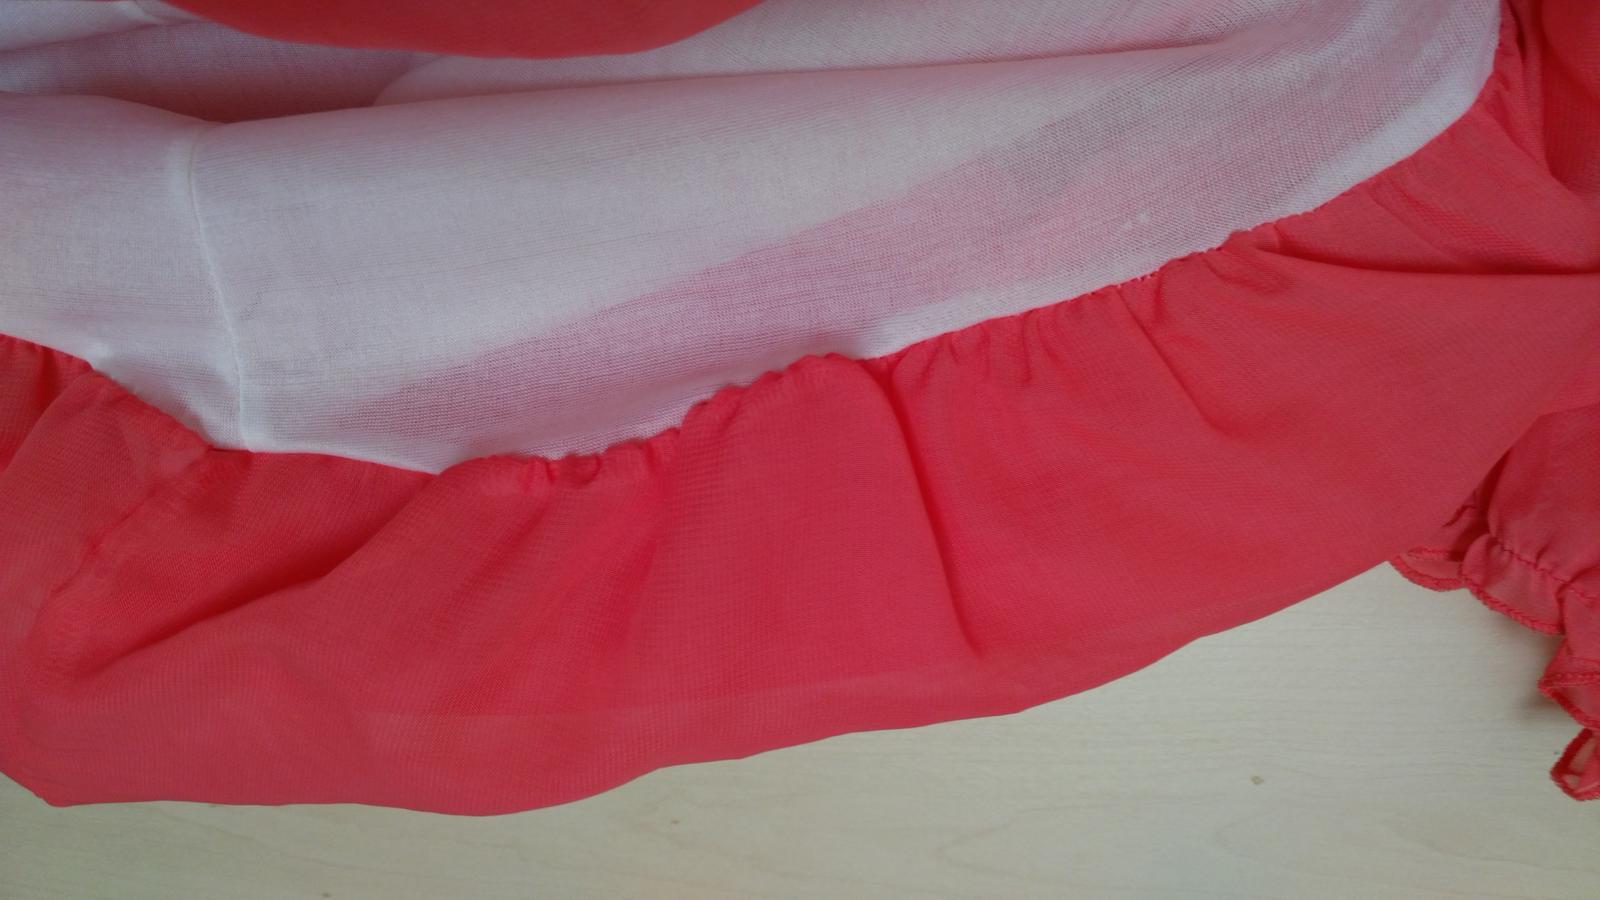 Lososové šifónové šaty 36-38 (S-M) - Obrázok č. 3